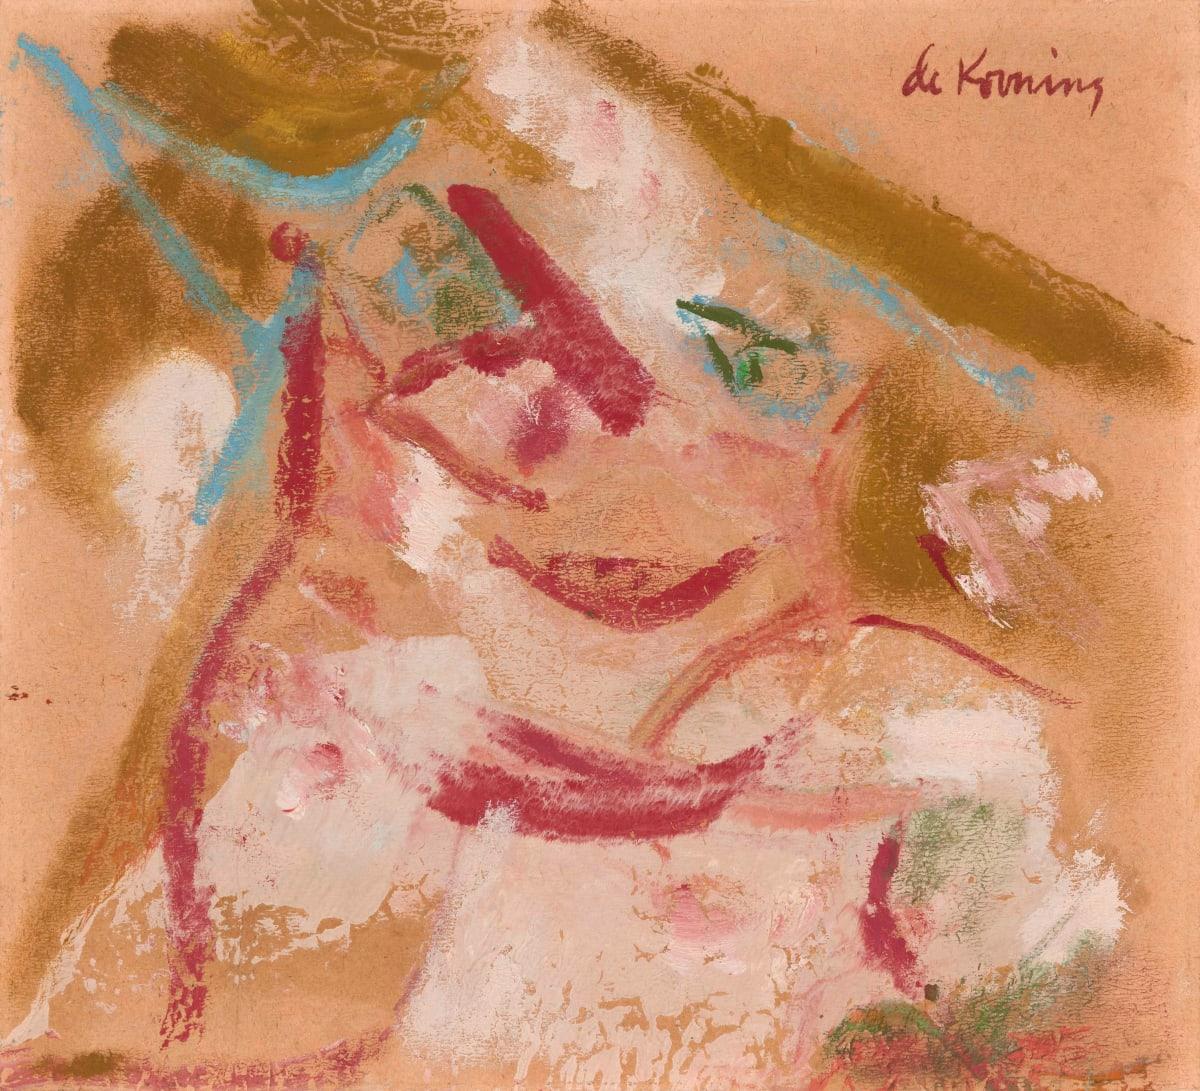 Willem De Kooning, Pink Woman, 1964